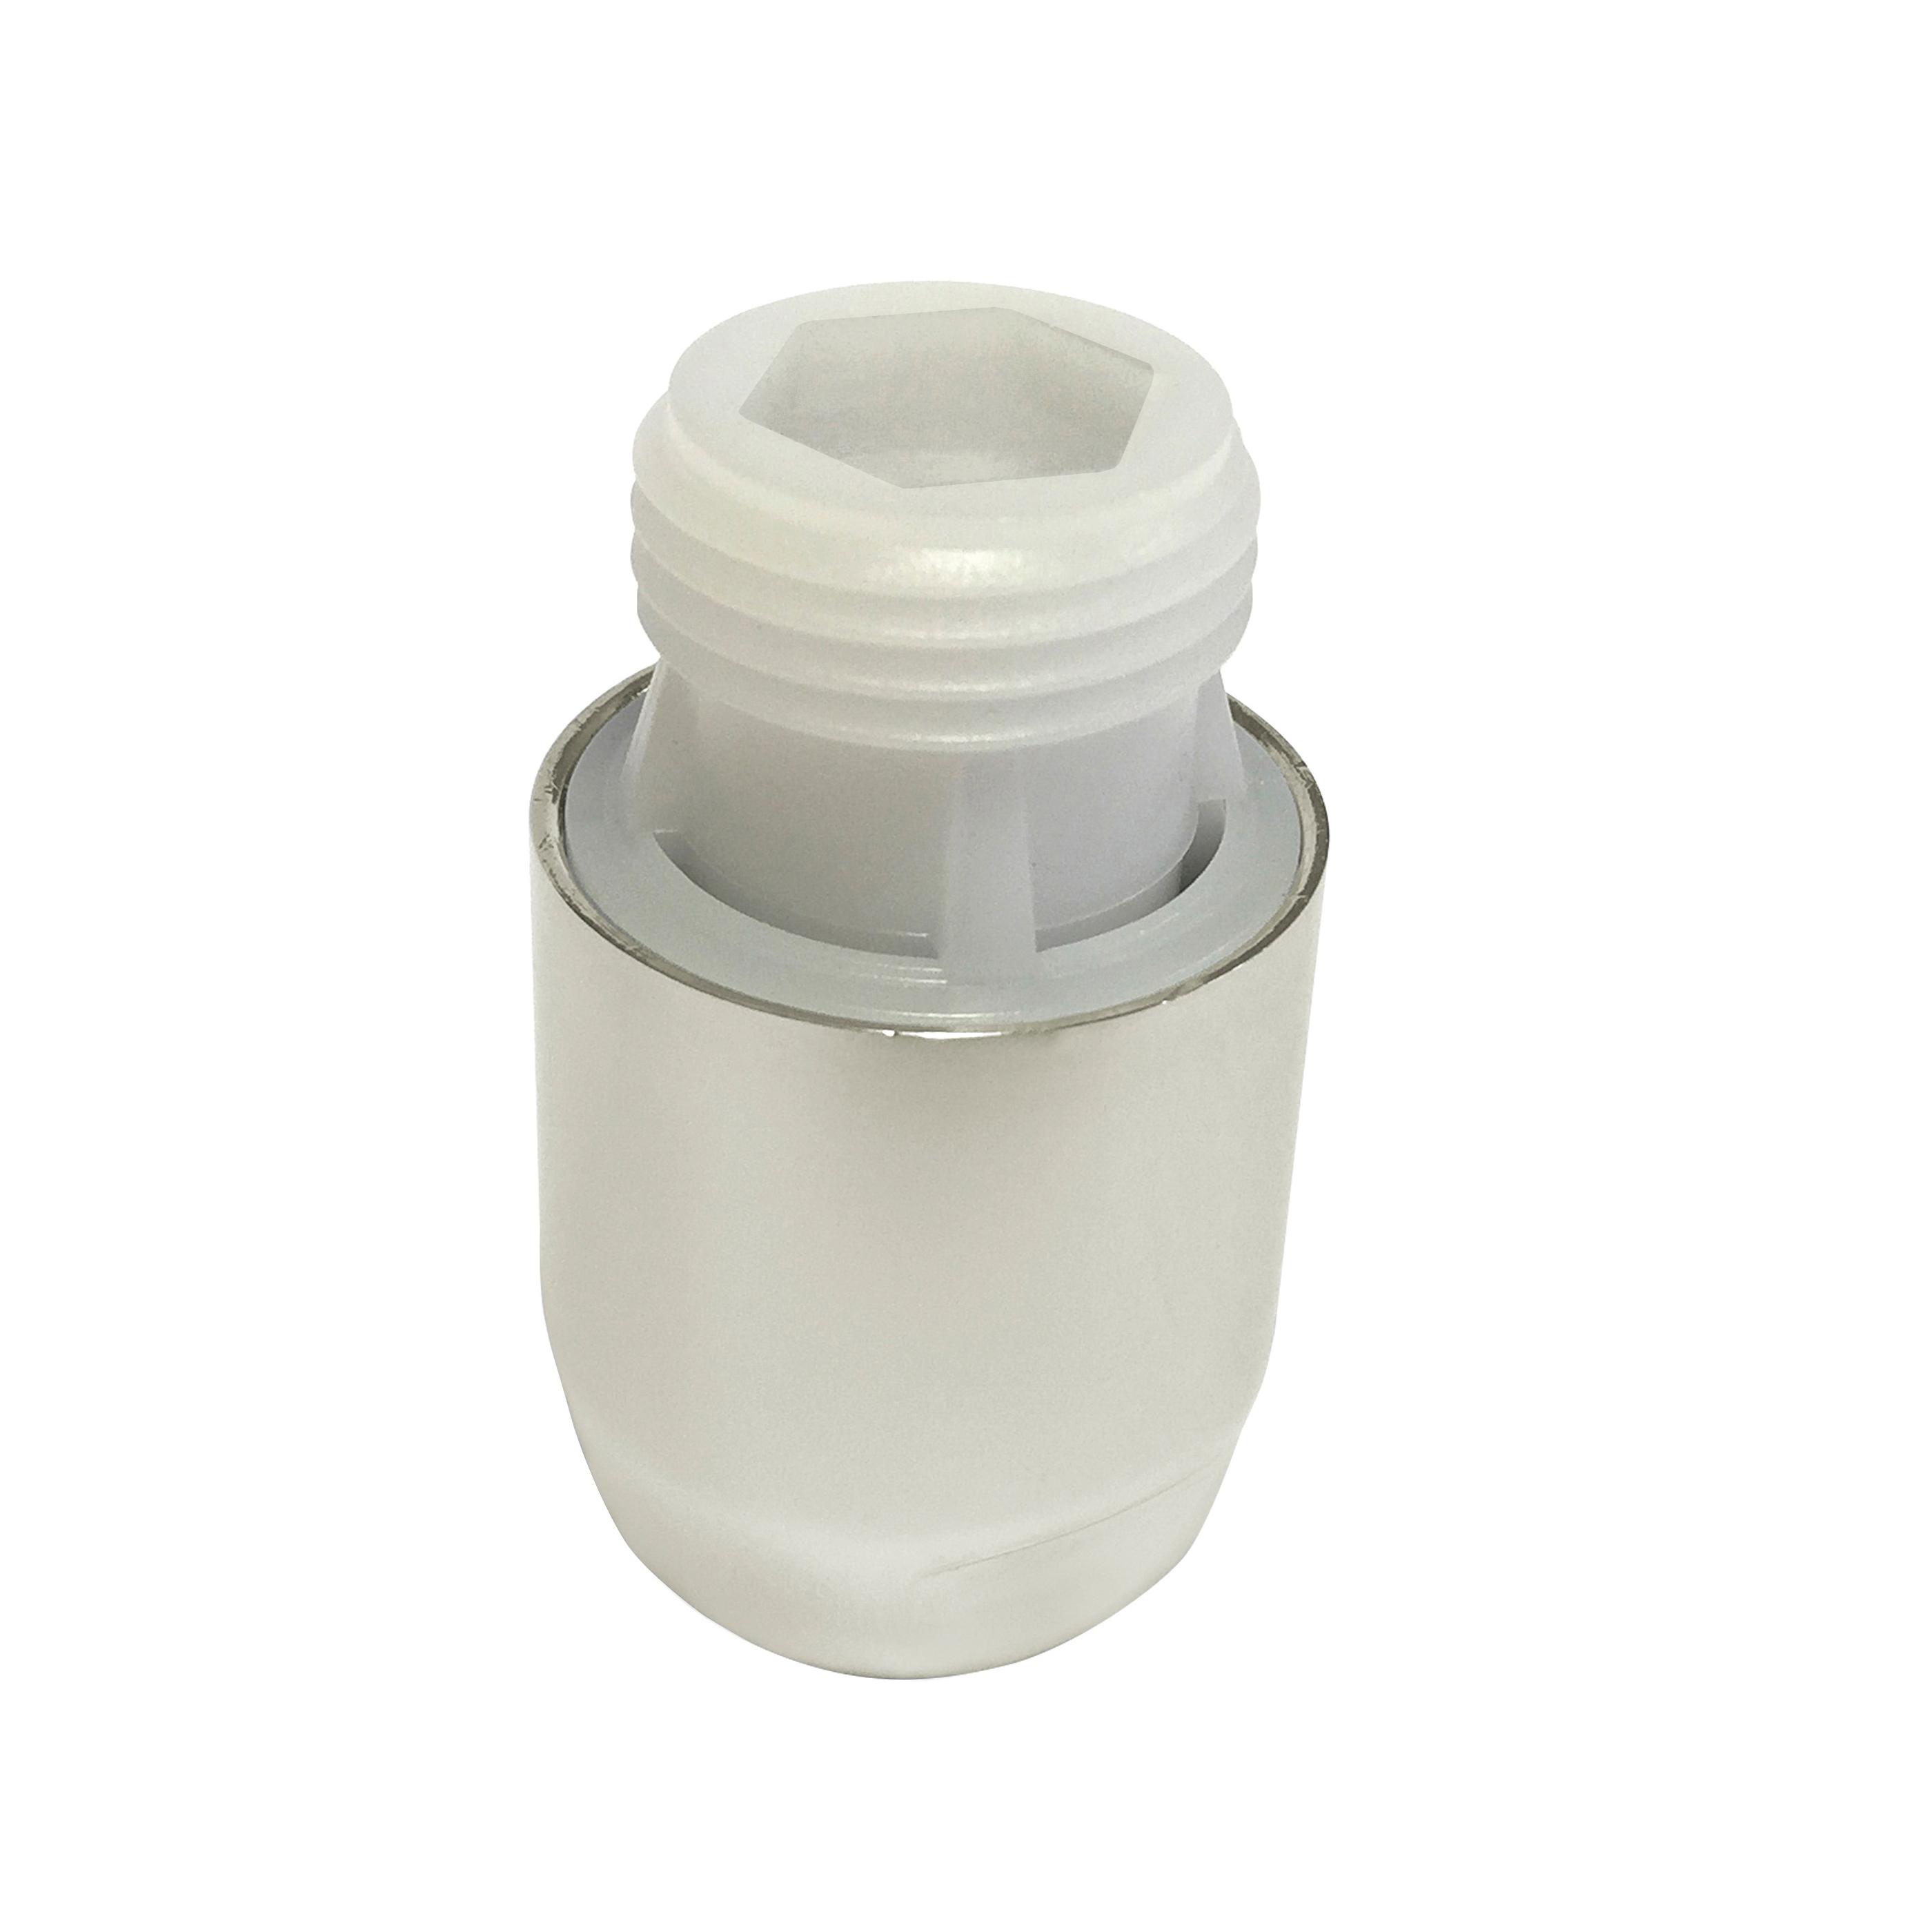 Rohl® V00275-PN Finished Vacuum Breaker, 1/2 in, Male x Female, Brass Body